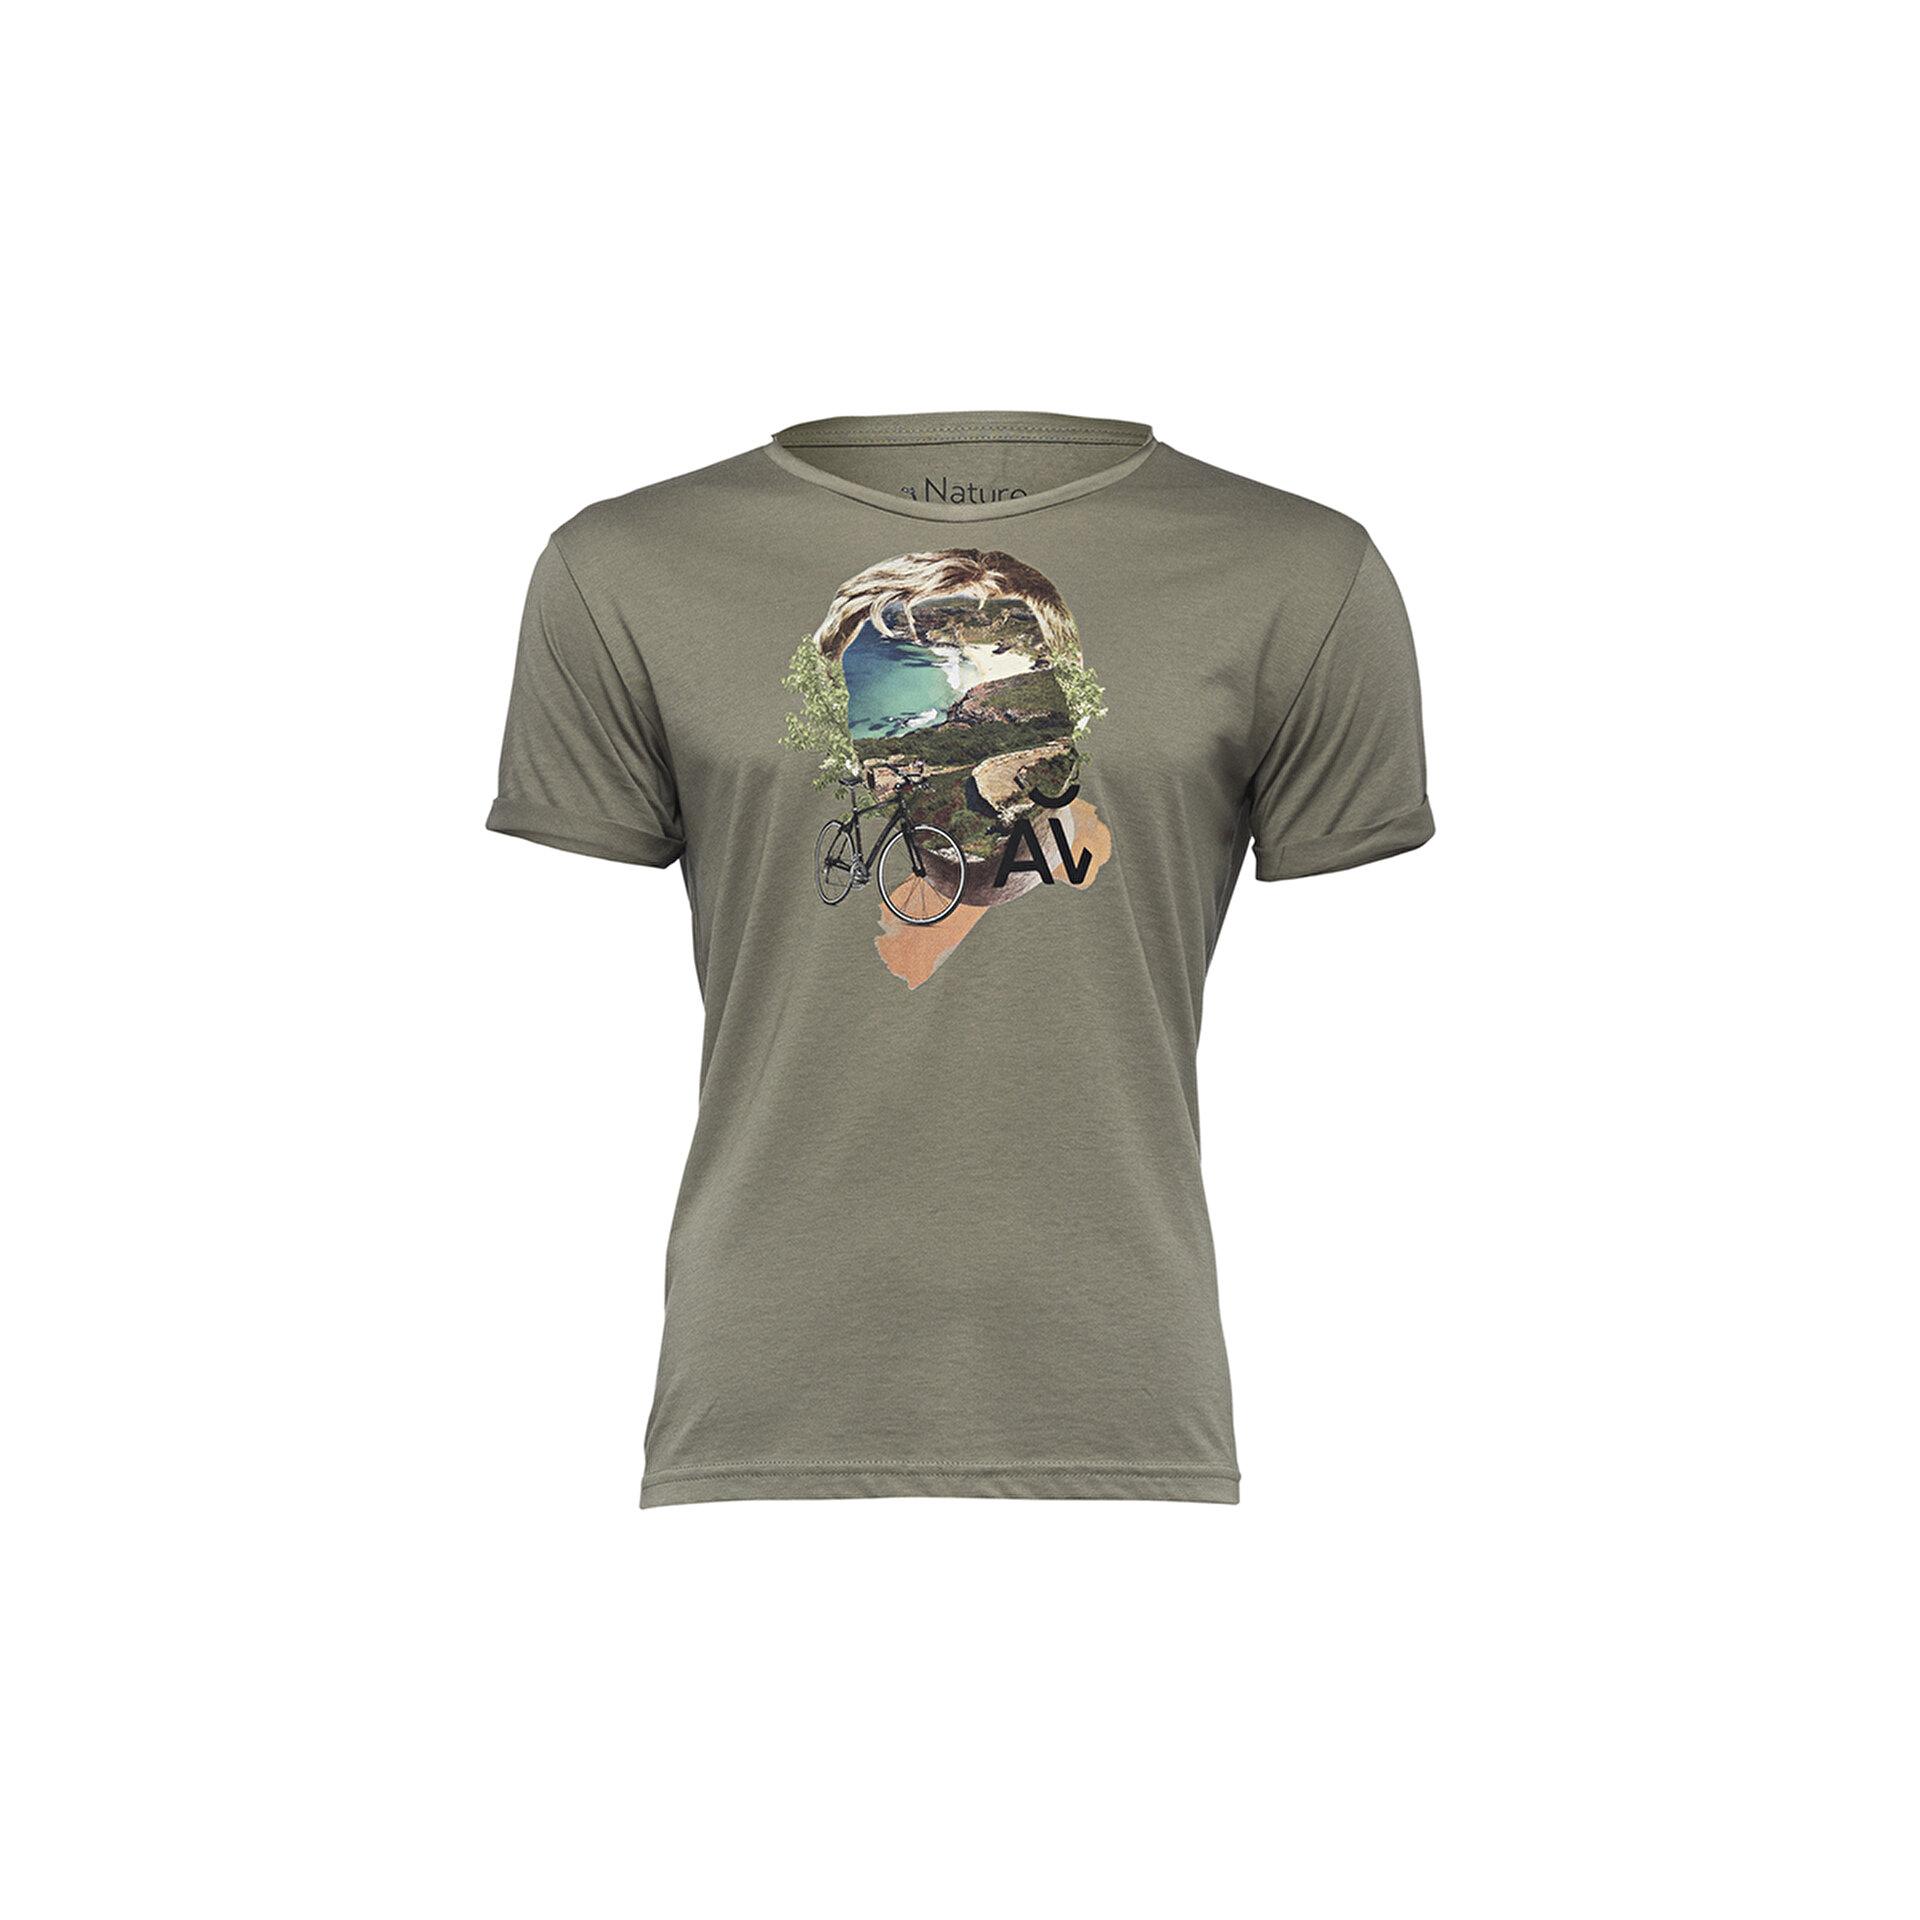 Picture of BiggDesign Nature Maceraperest Erkek T-shirt